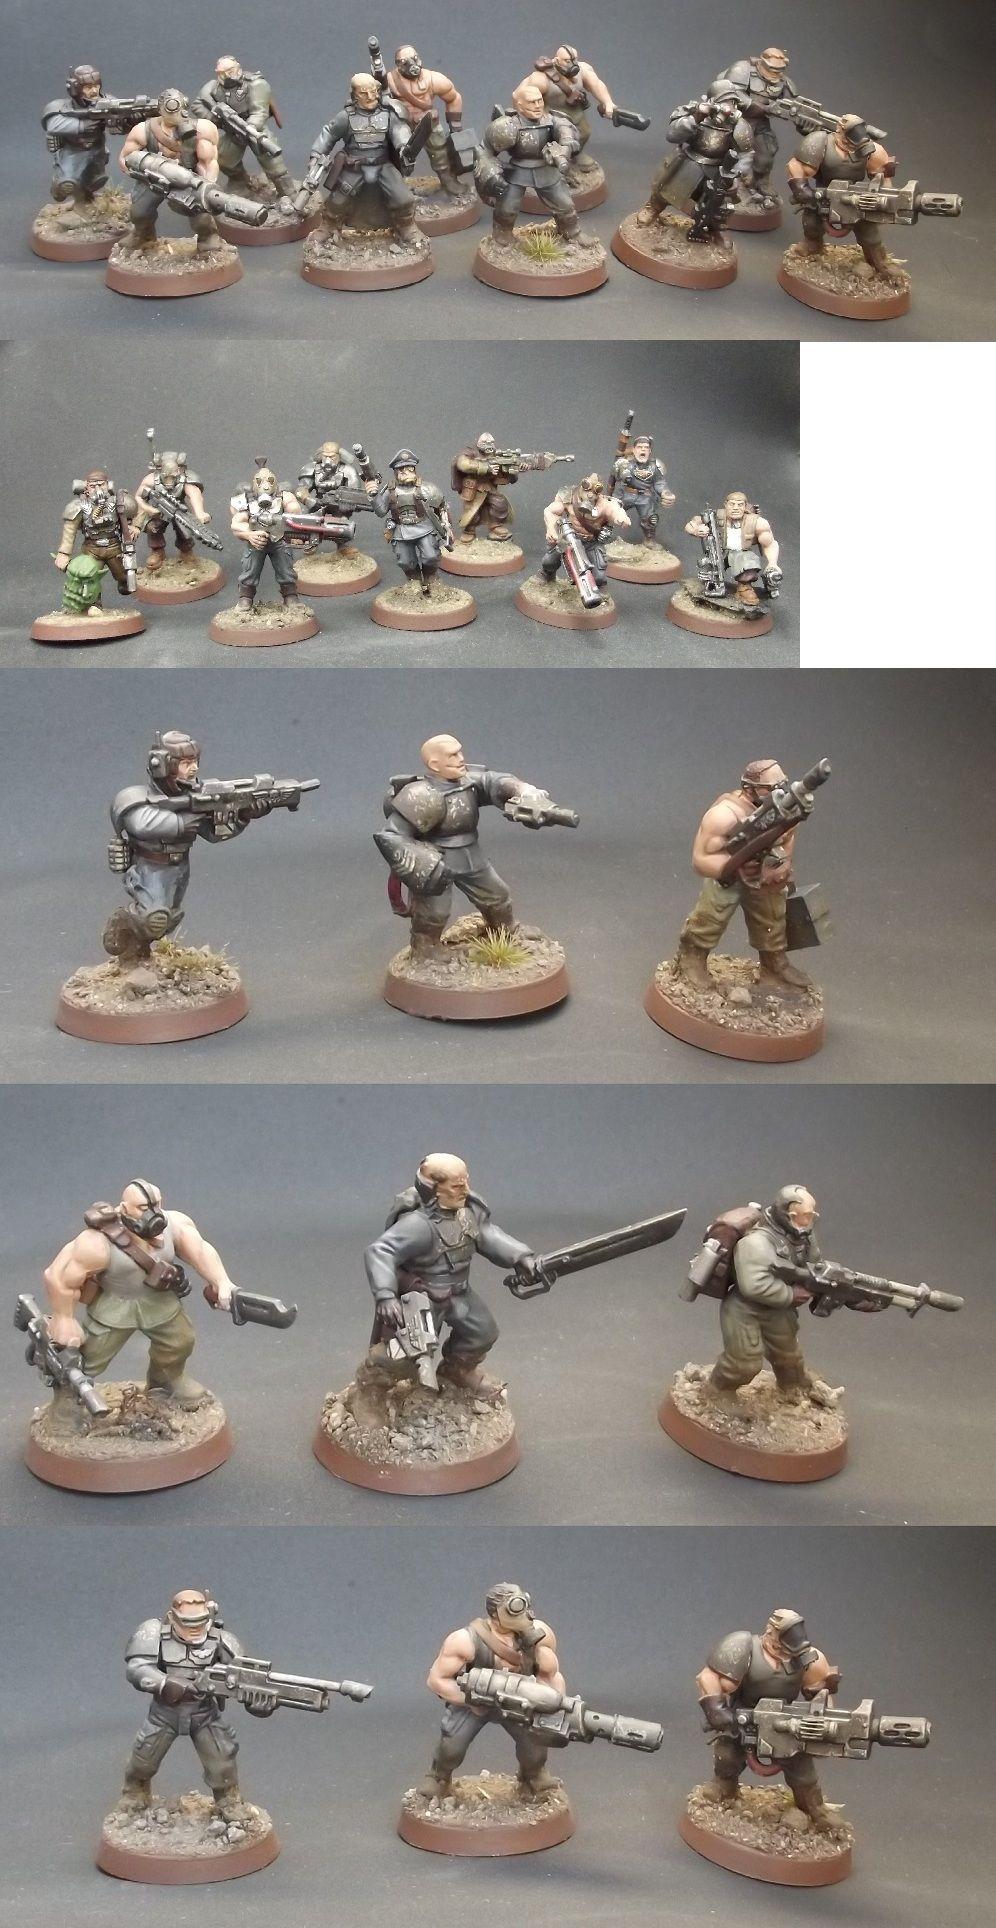 Coolminiornot Savlar Chem Dogs Infantry Squad Warhammer Imperial Guard Warhammer 40k Miniatures Cyberpunk Rpg